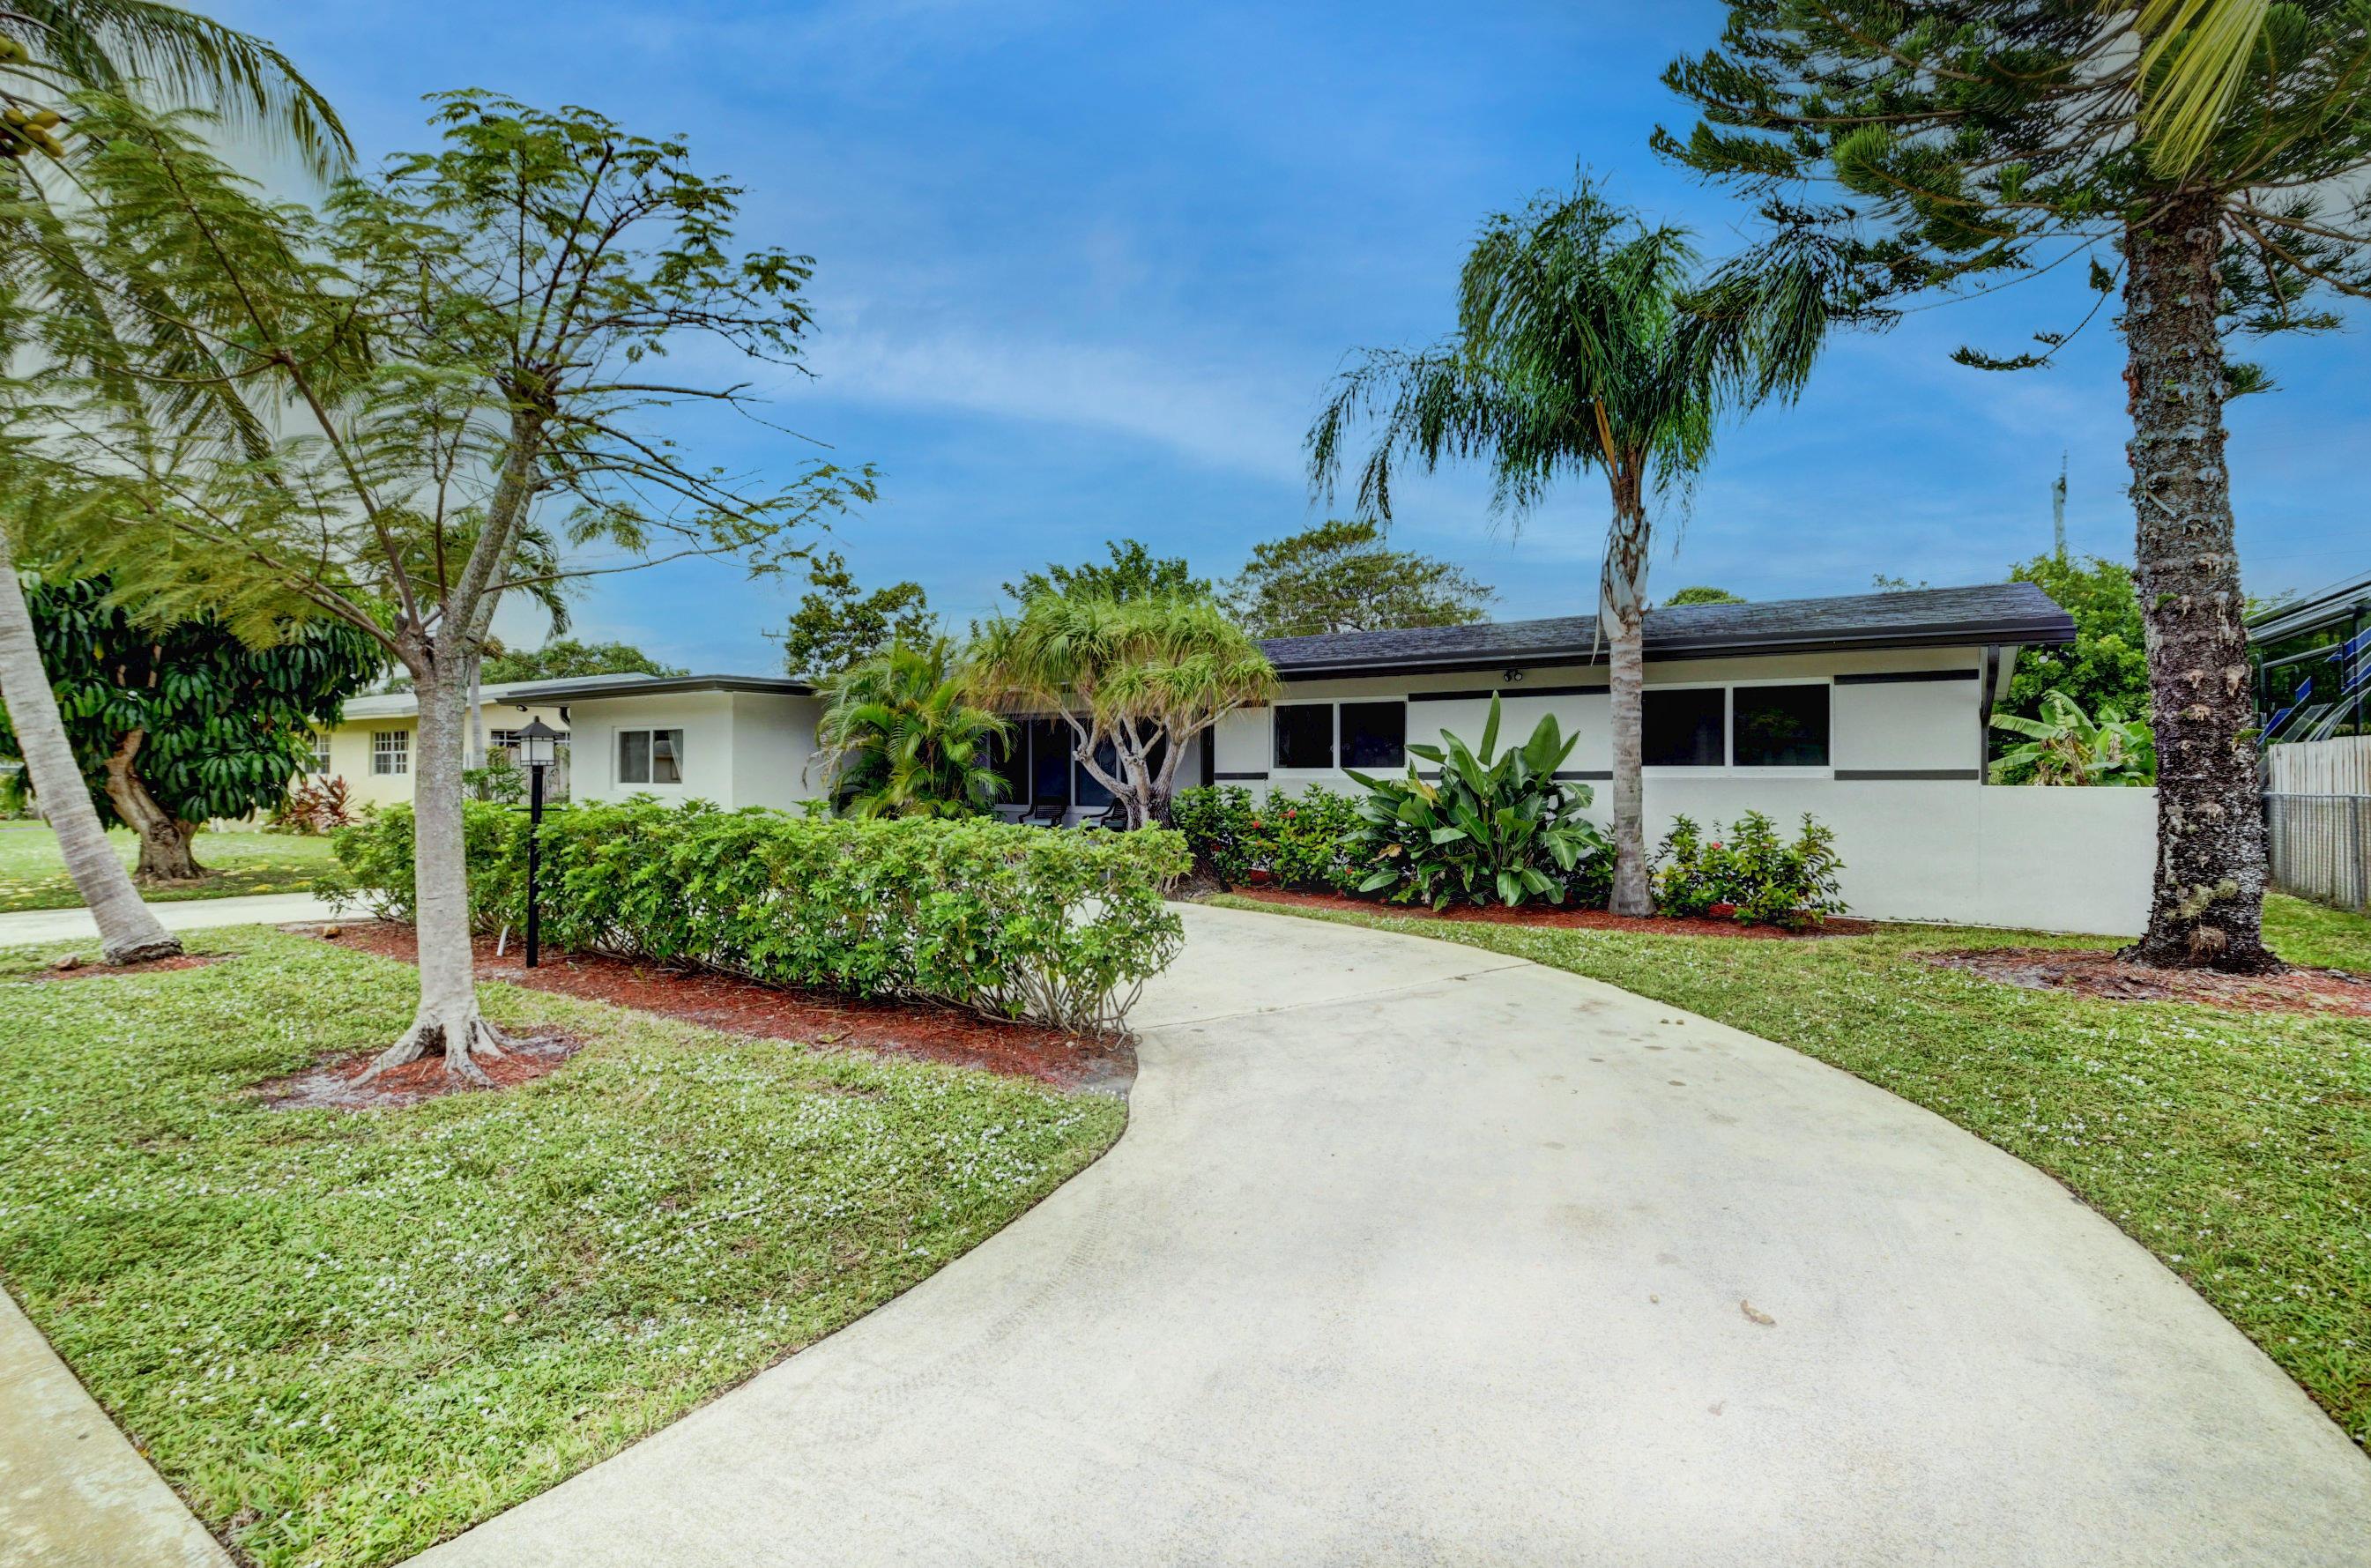 1225 Nw Street Boca Raton, FL 33486